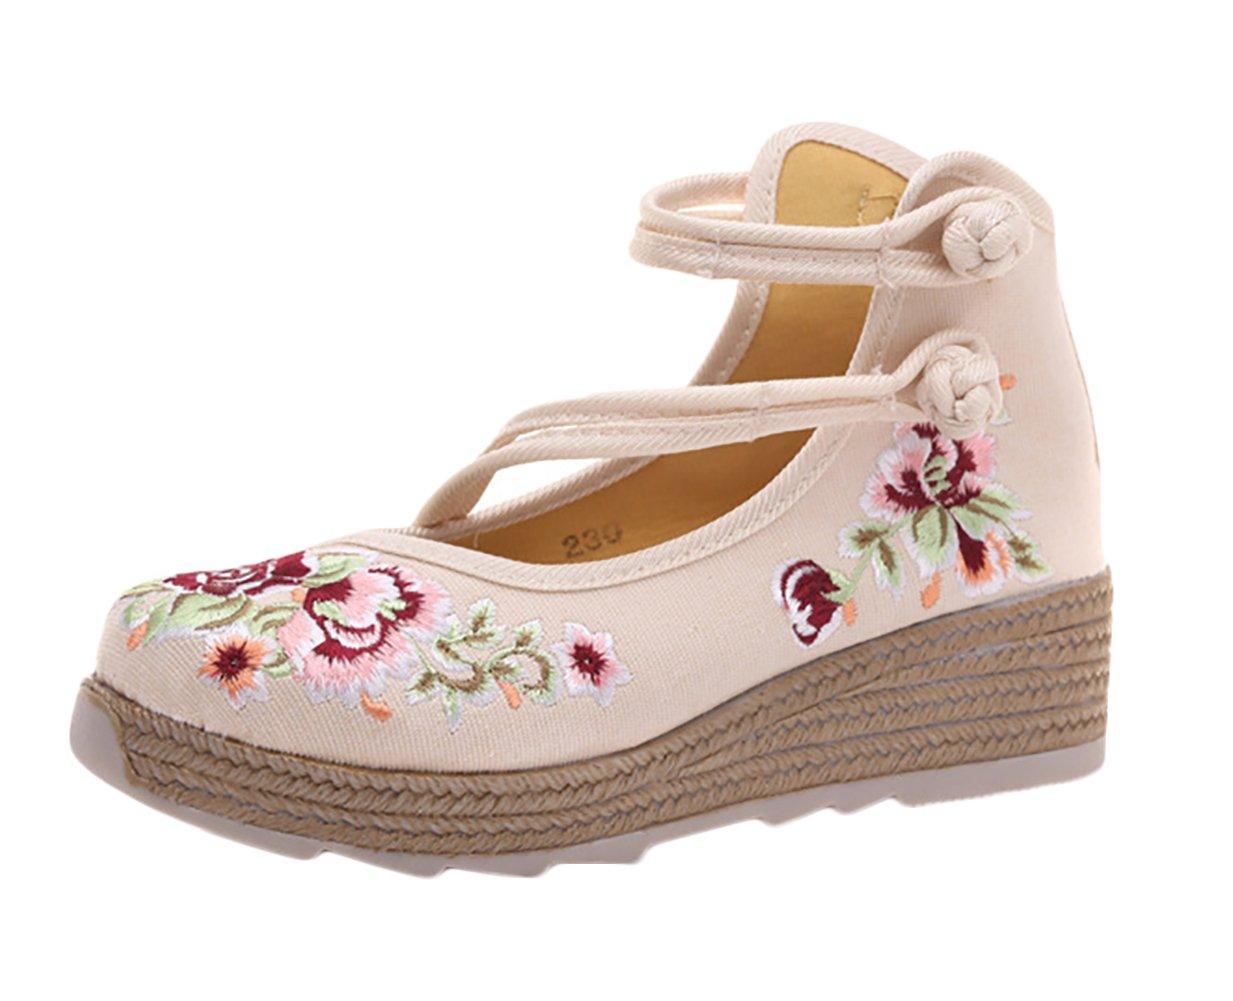 Insun Zapato Bailarinas con Correa Plataforma Hebilla Estilo Mary Jane 34 EU|Beige